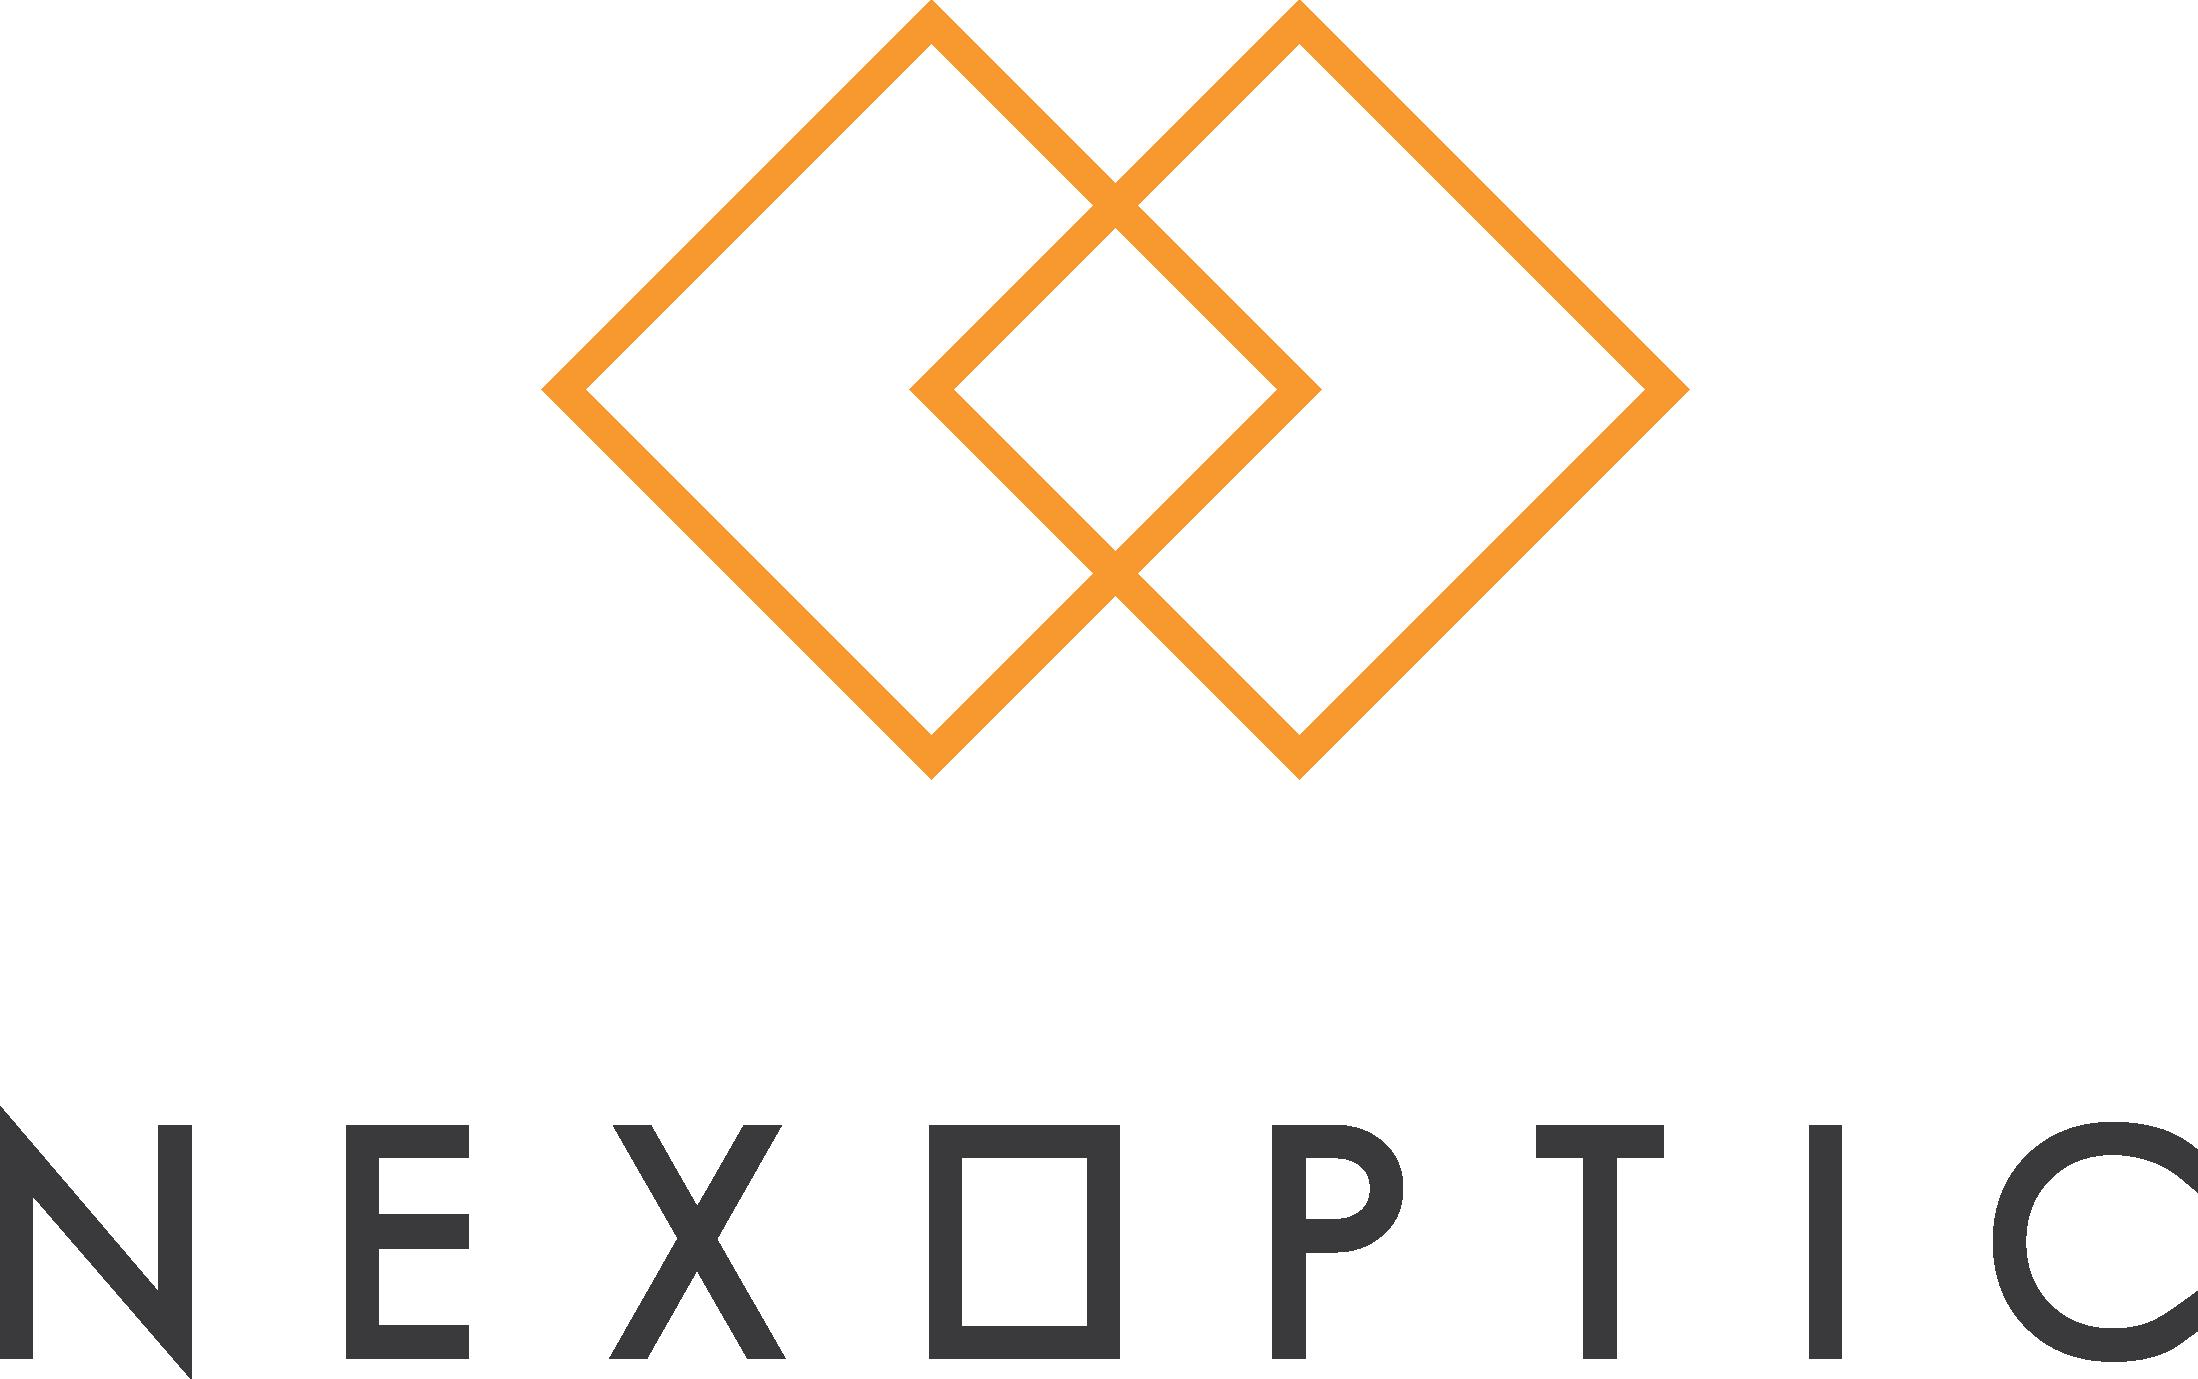 NexOptic Announces Stock Option Grant and Warrant Repricing